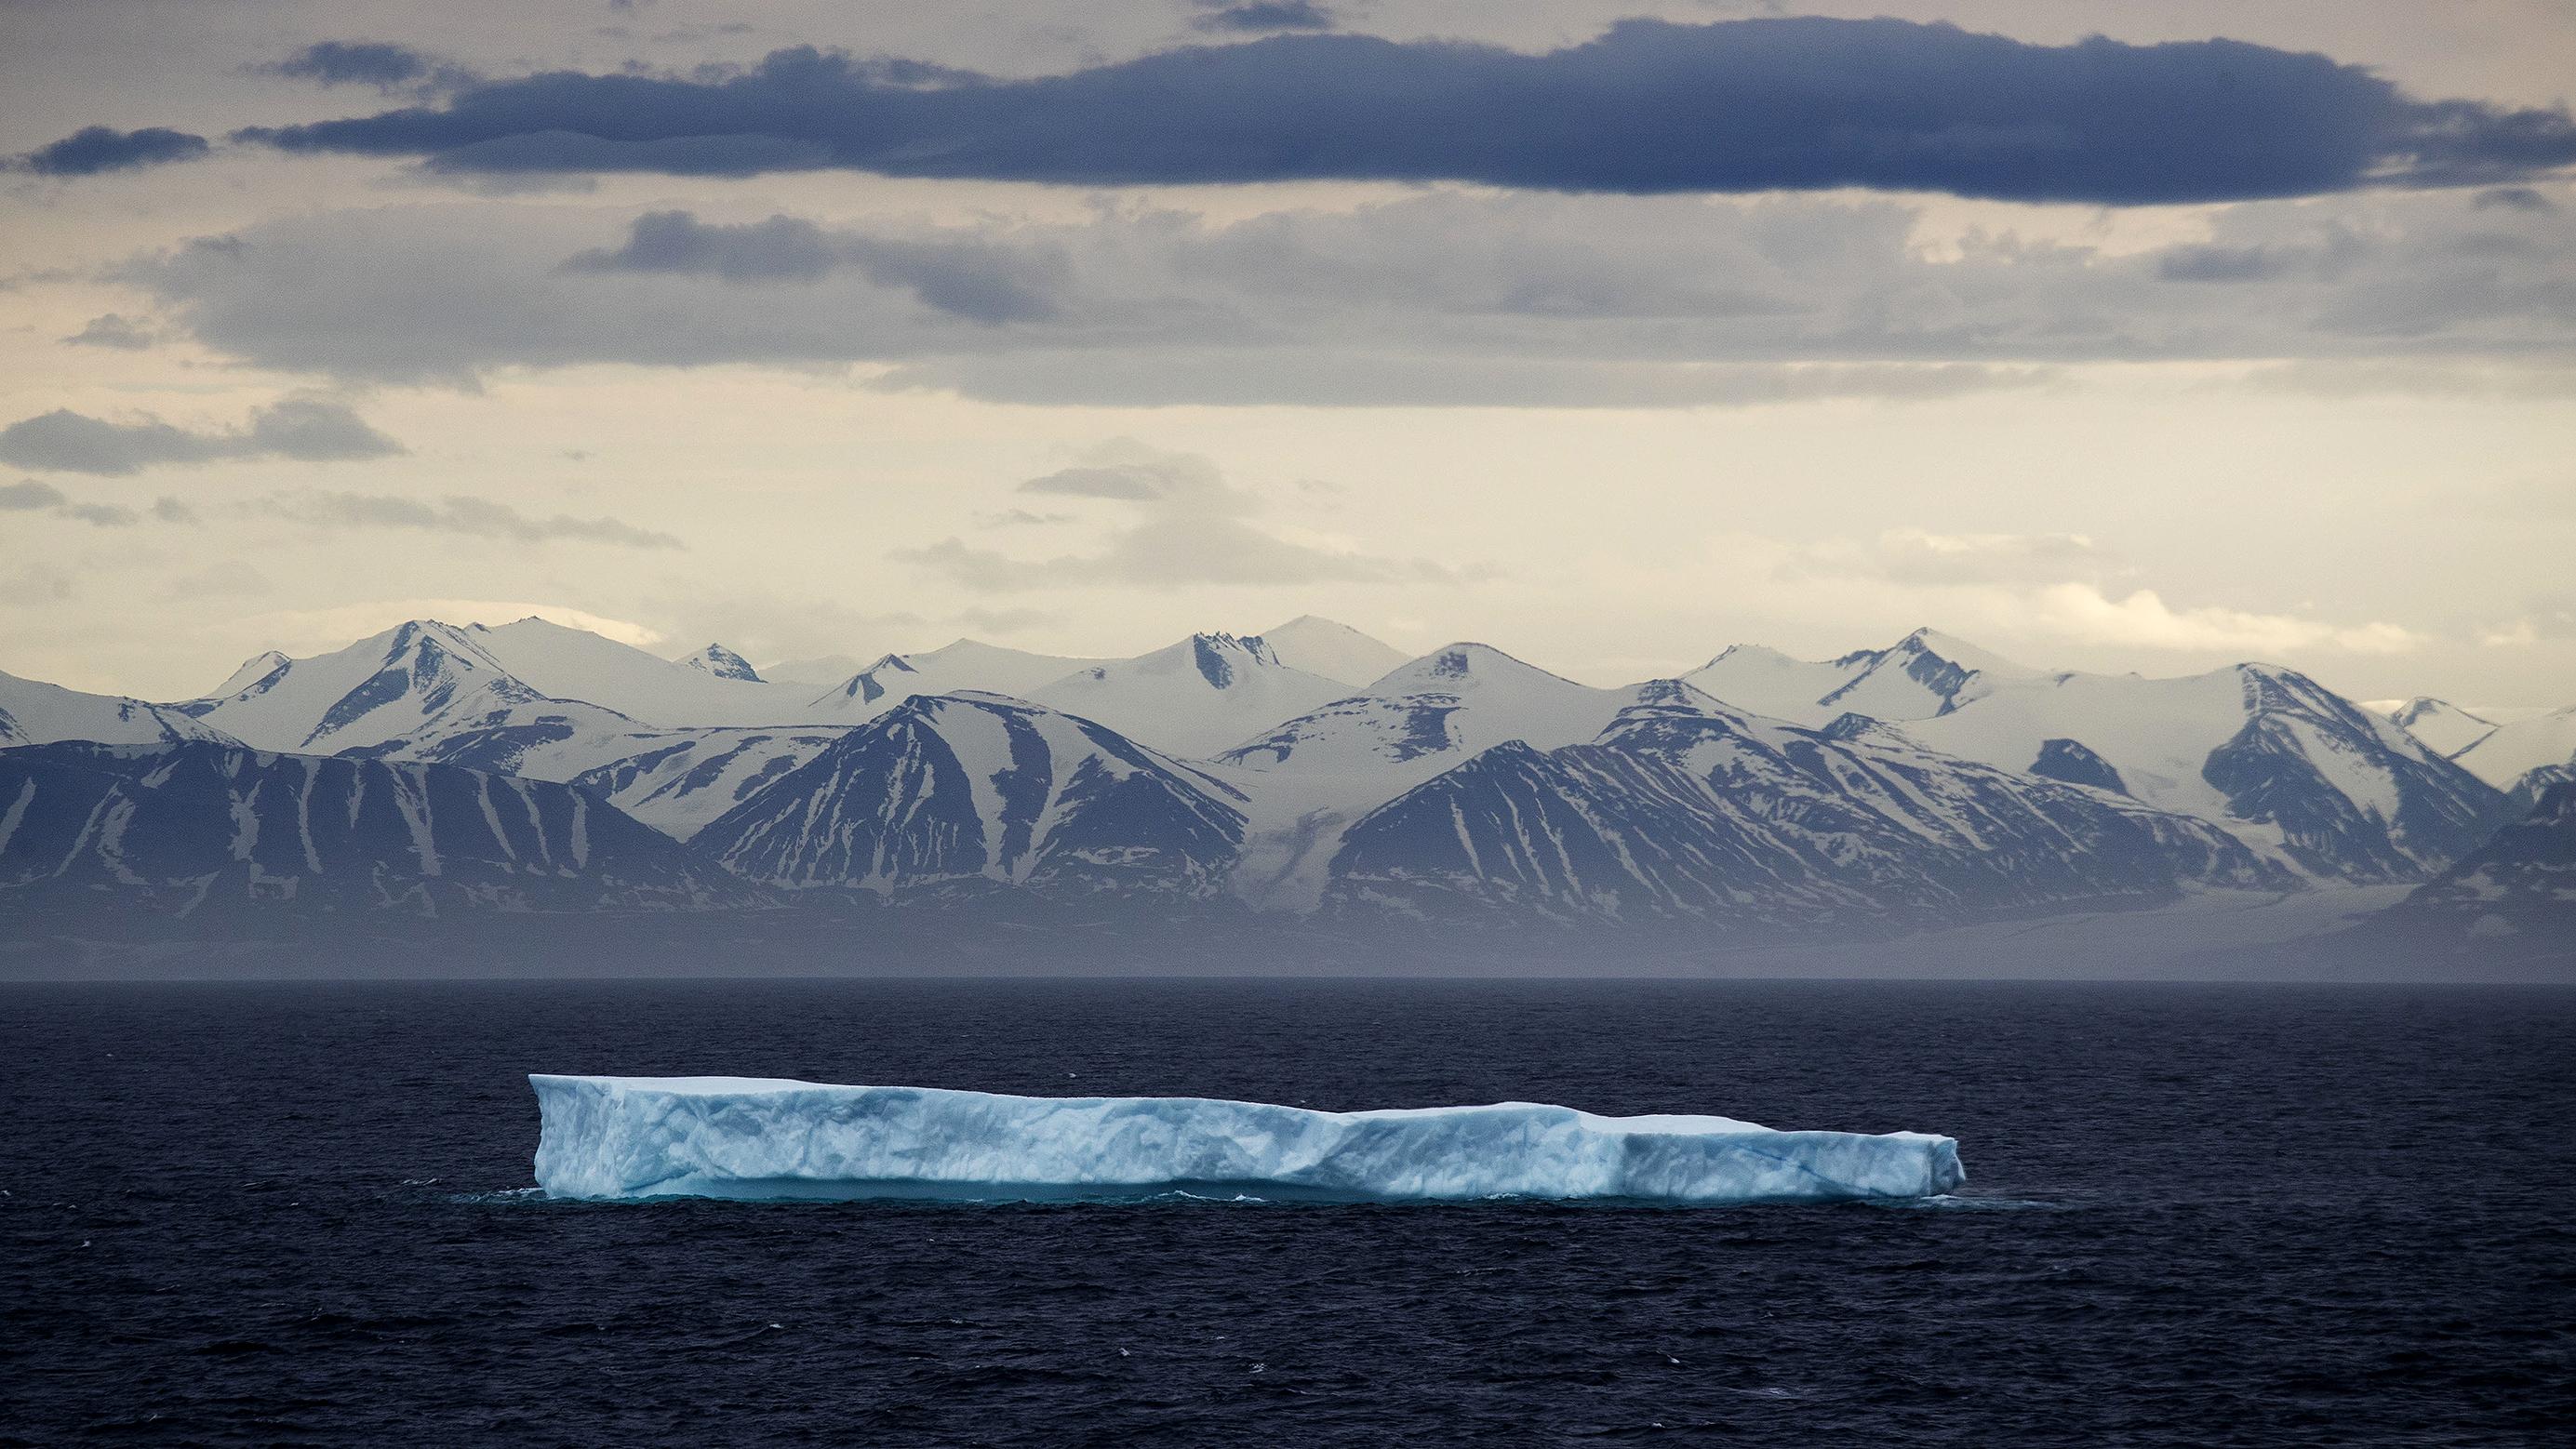 Photo: Iceberg. Climate Change, Global Warming